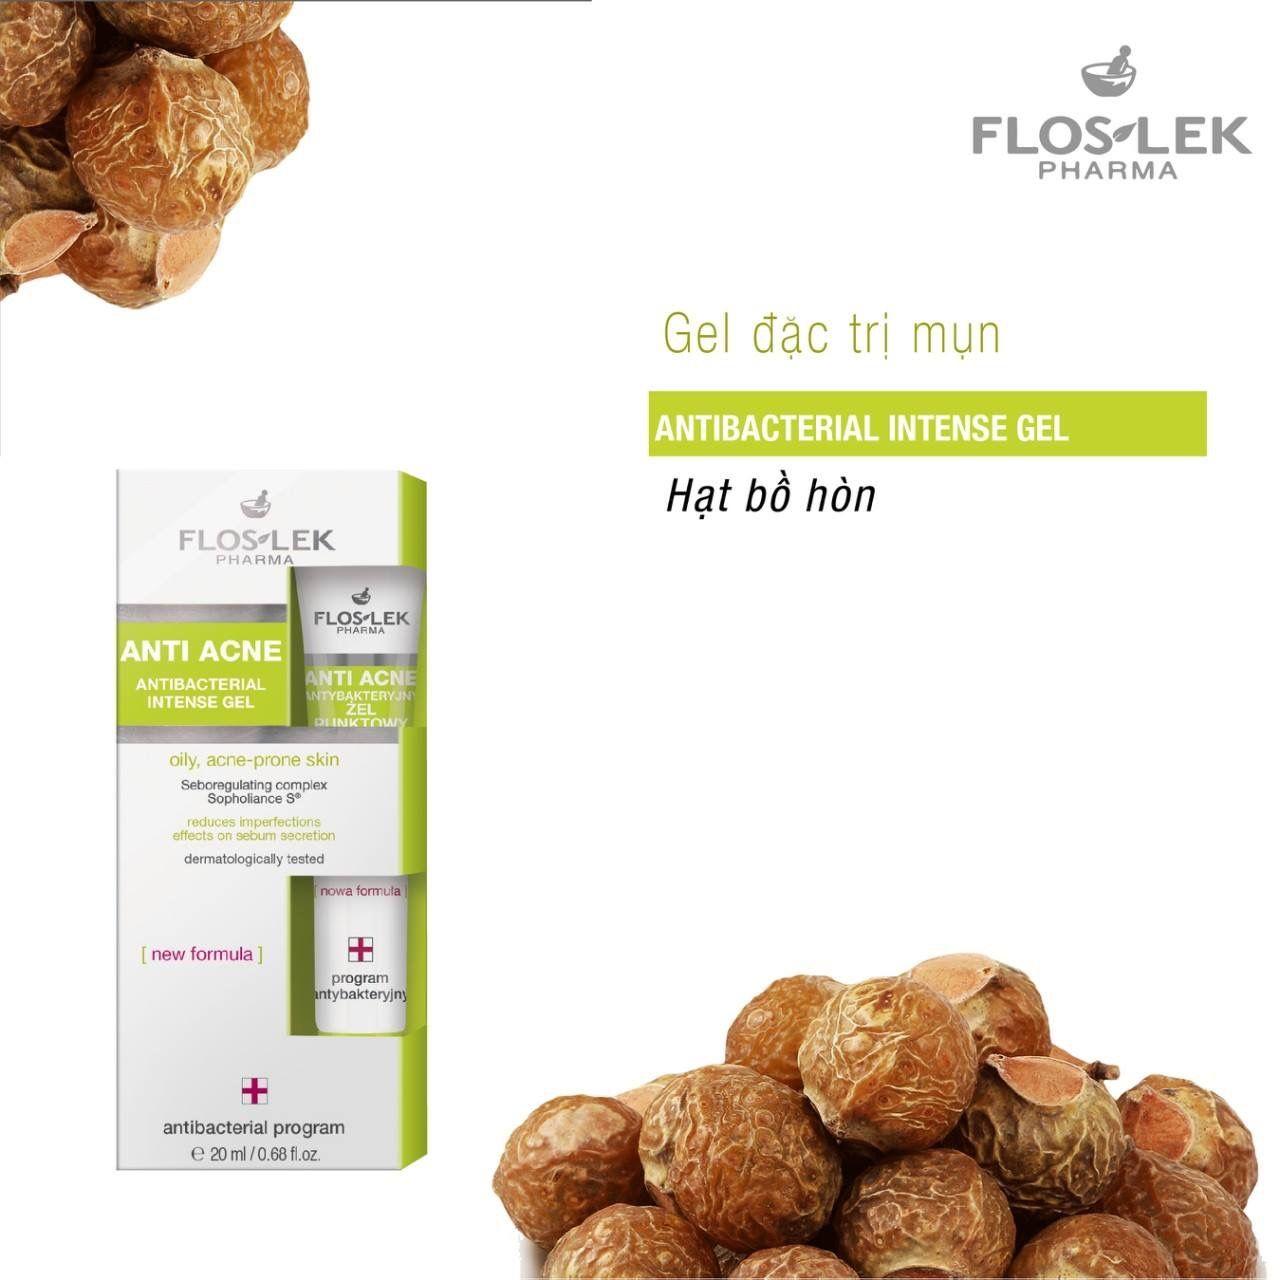 Kem trị mụn Floslek anti acne antibacterial intense gel 20ml đặc trị mụn    Trị mụn